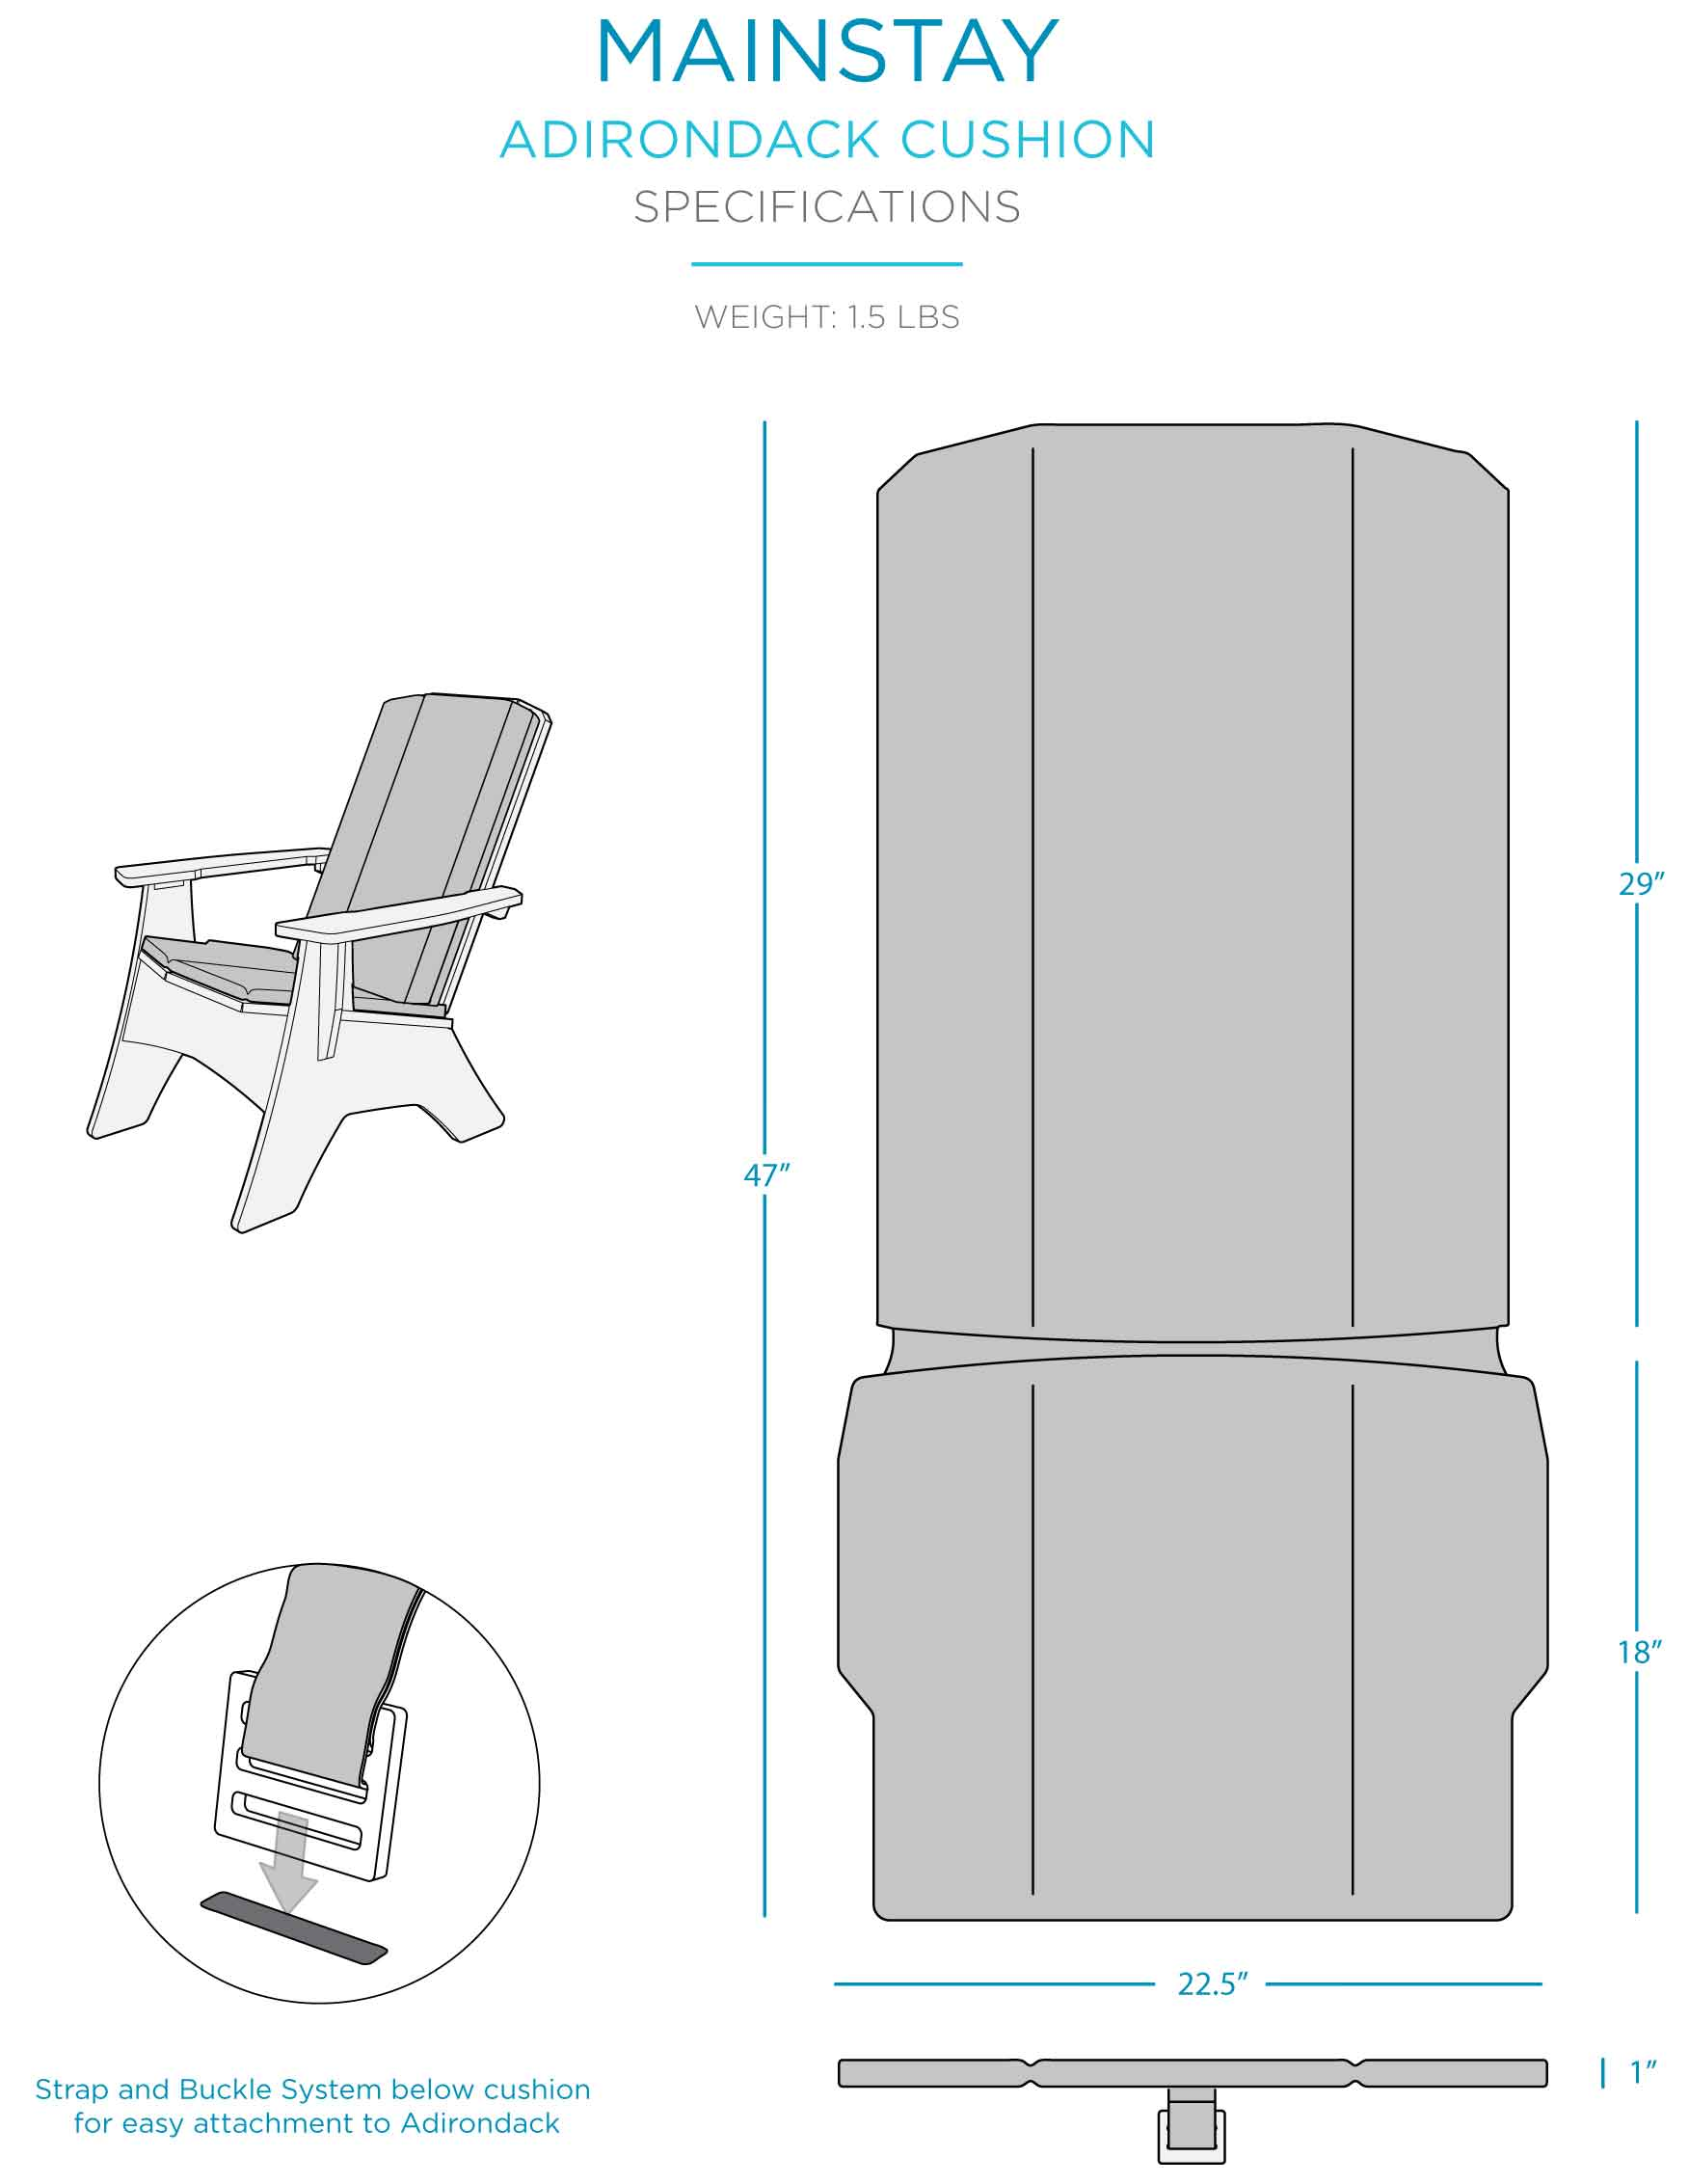 mainstay-adirondack-cushion-specifications